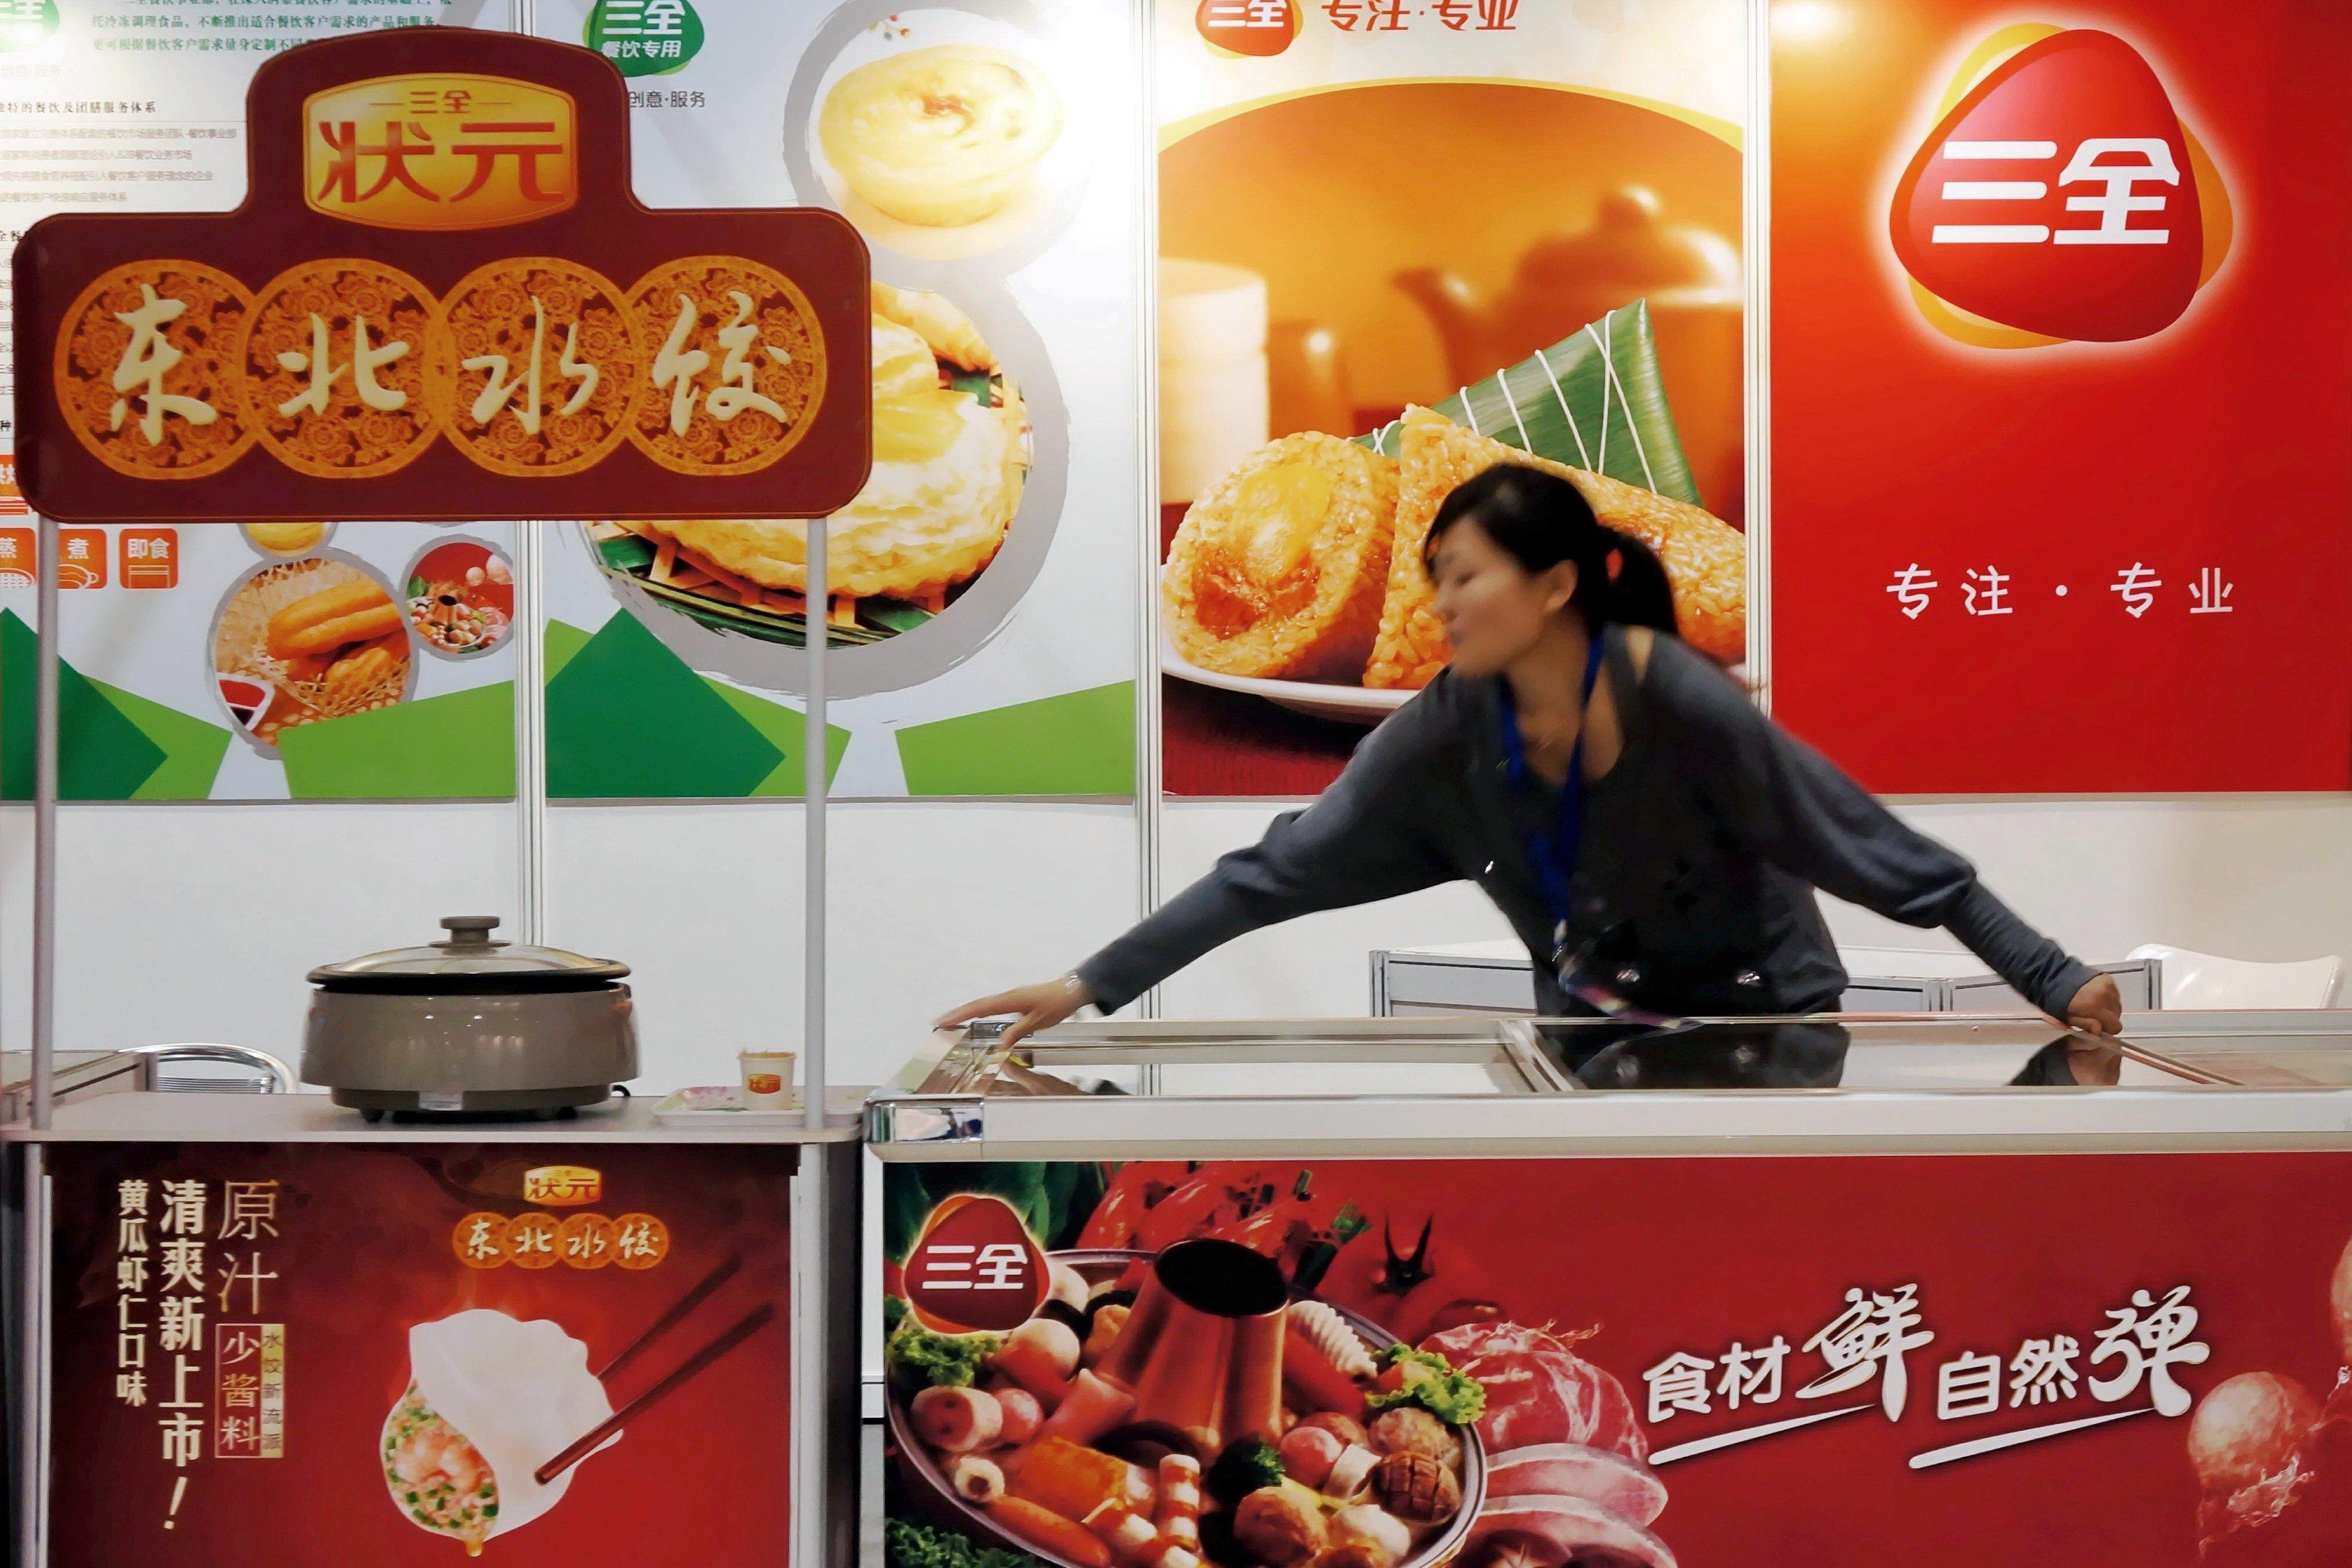 African swine fever: Chinese frozen foods firm Sanquan recalls suspected contaminated goods